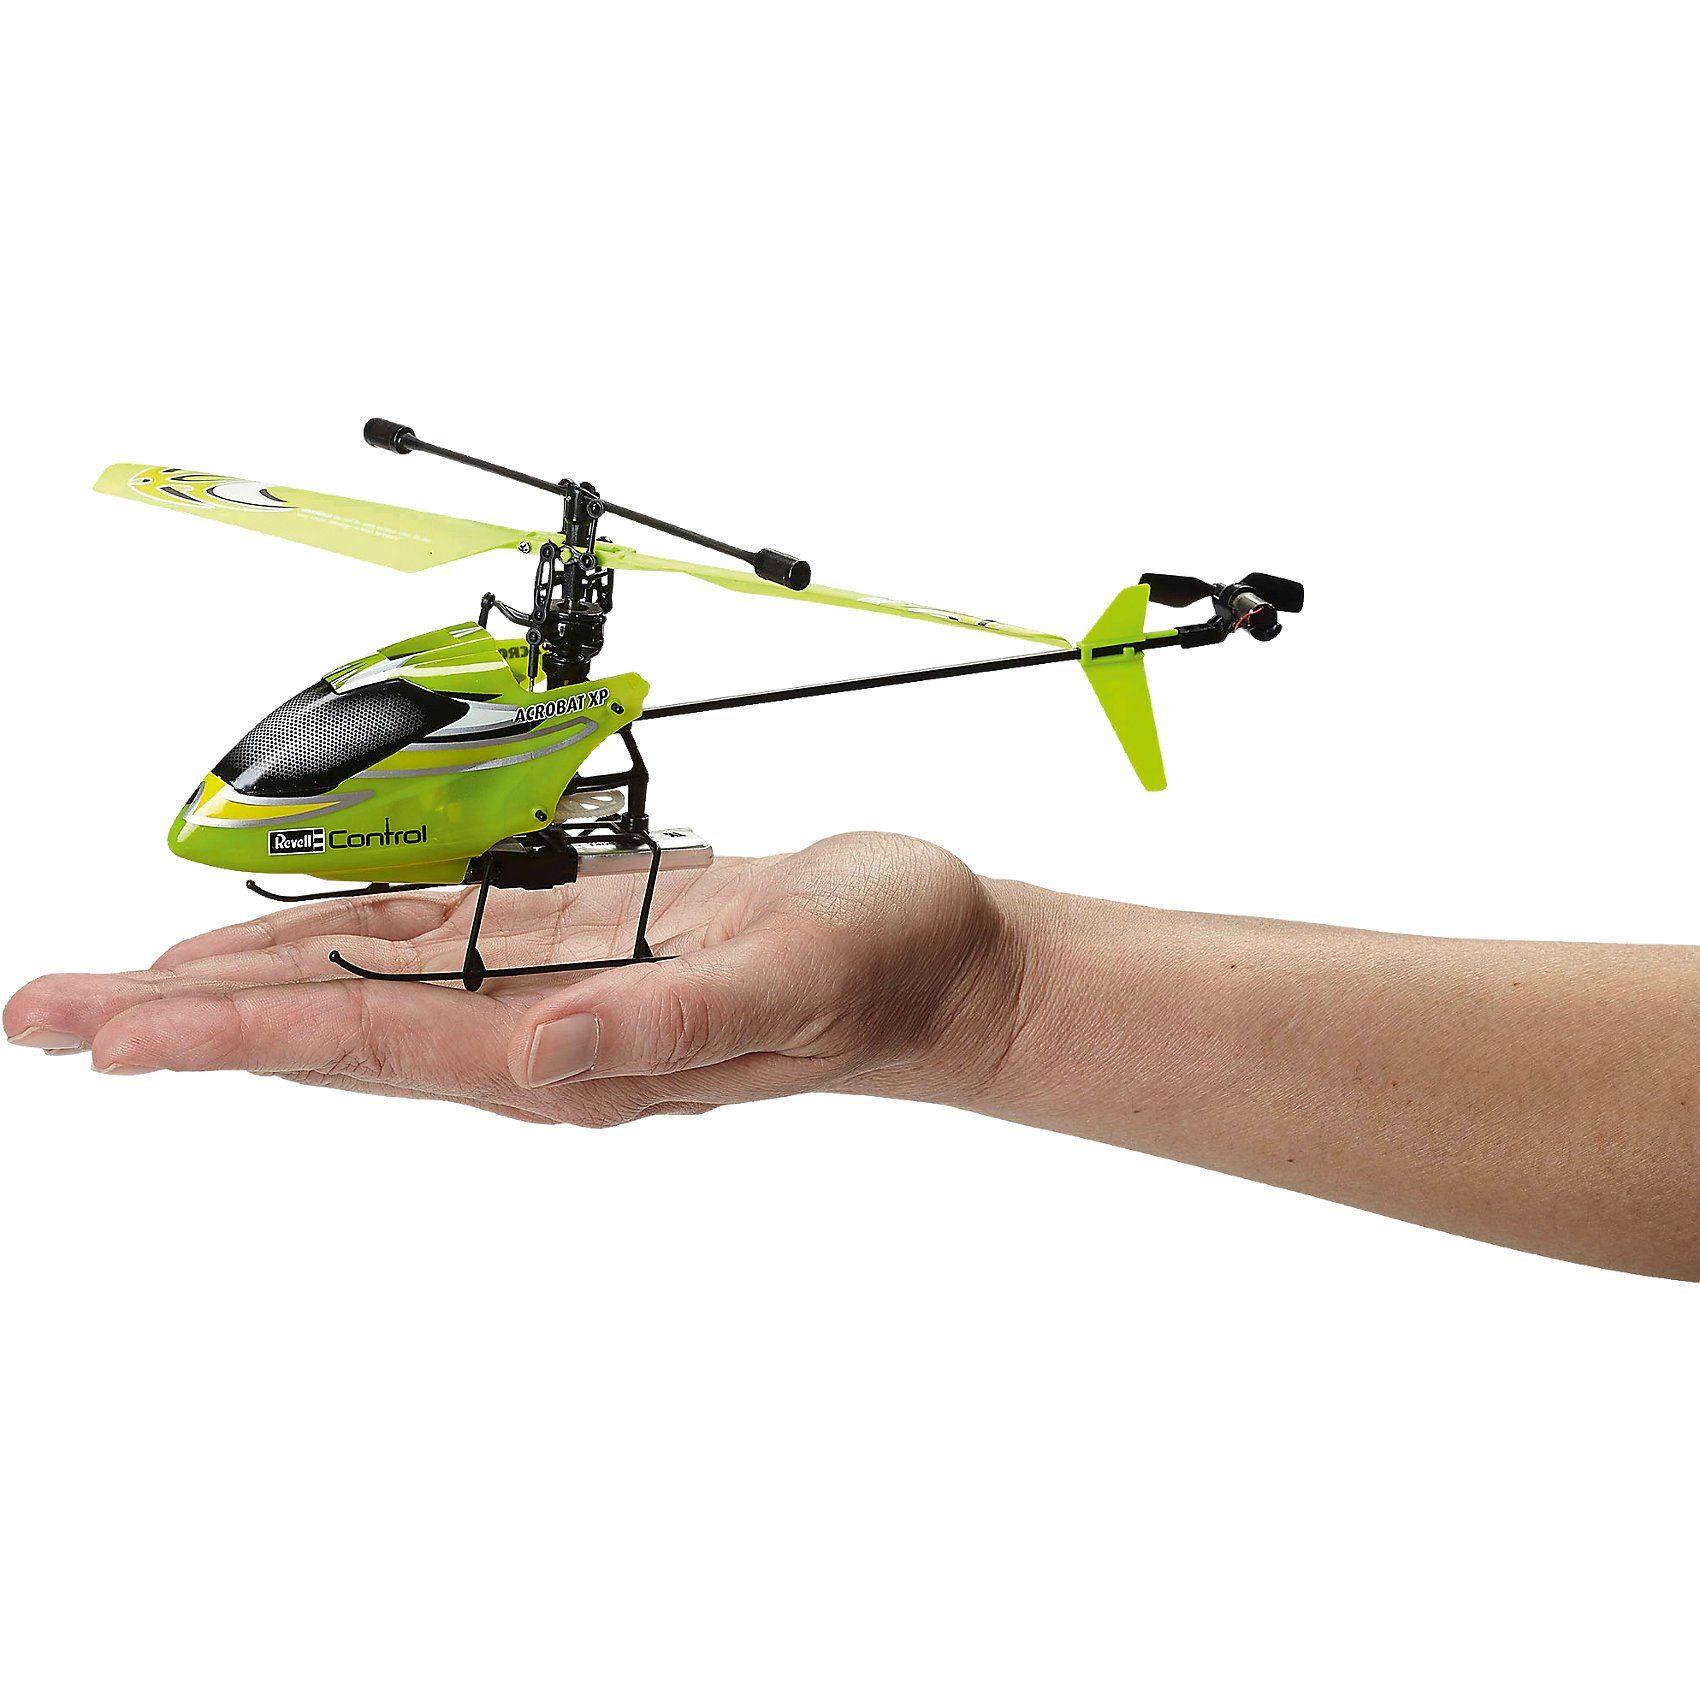 "Revell® Control RC Helikopter Singlerotor-Heli ""ACROBAT XP"""